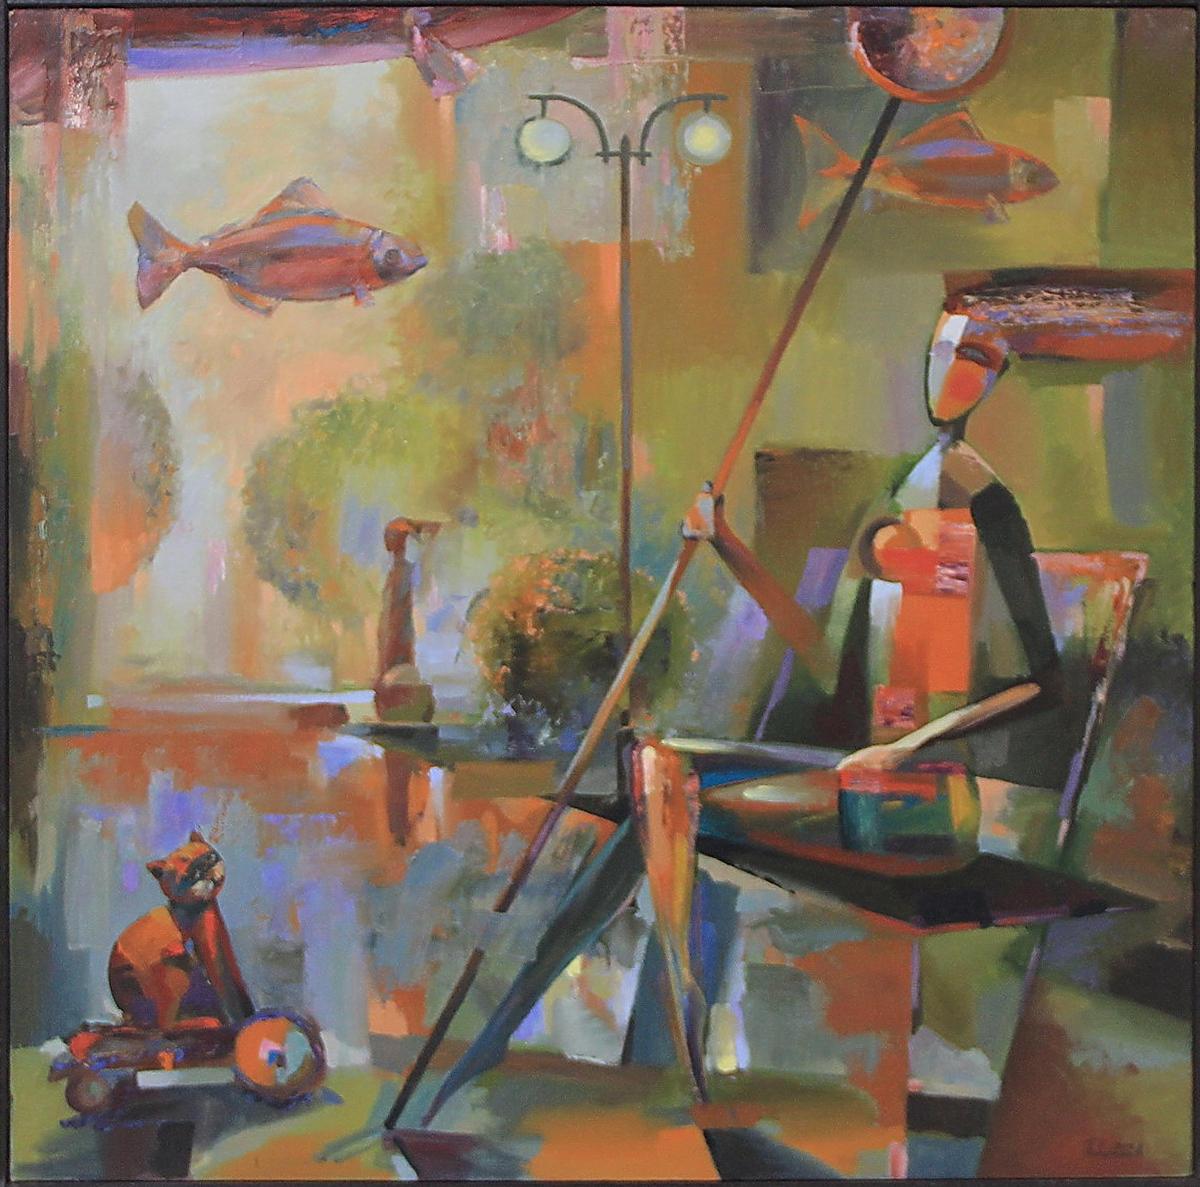 Поваринис В. Ловись рыбка. 2016